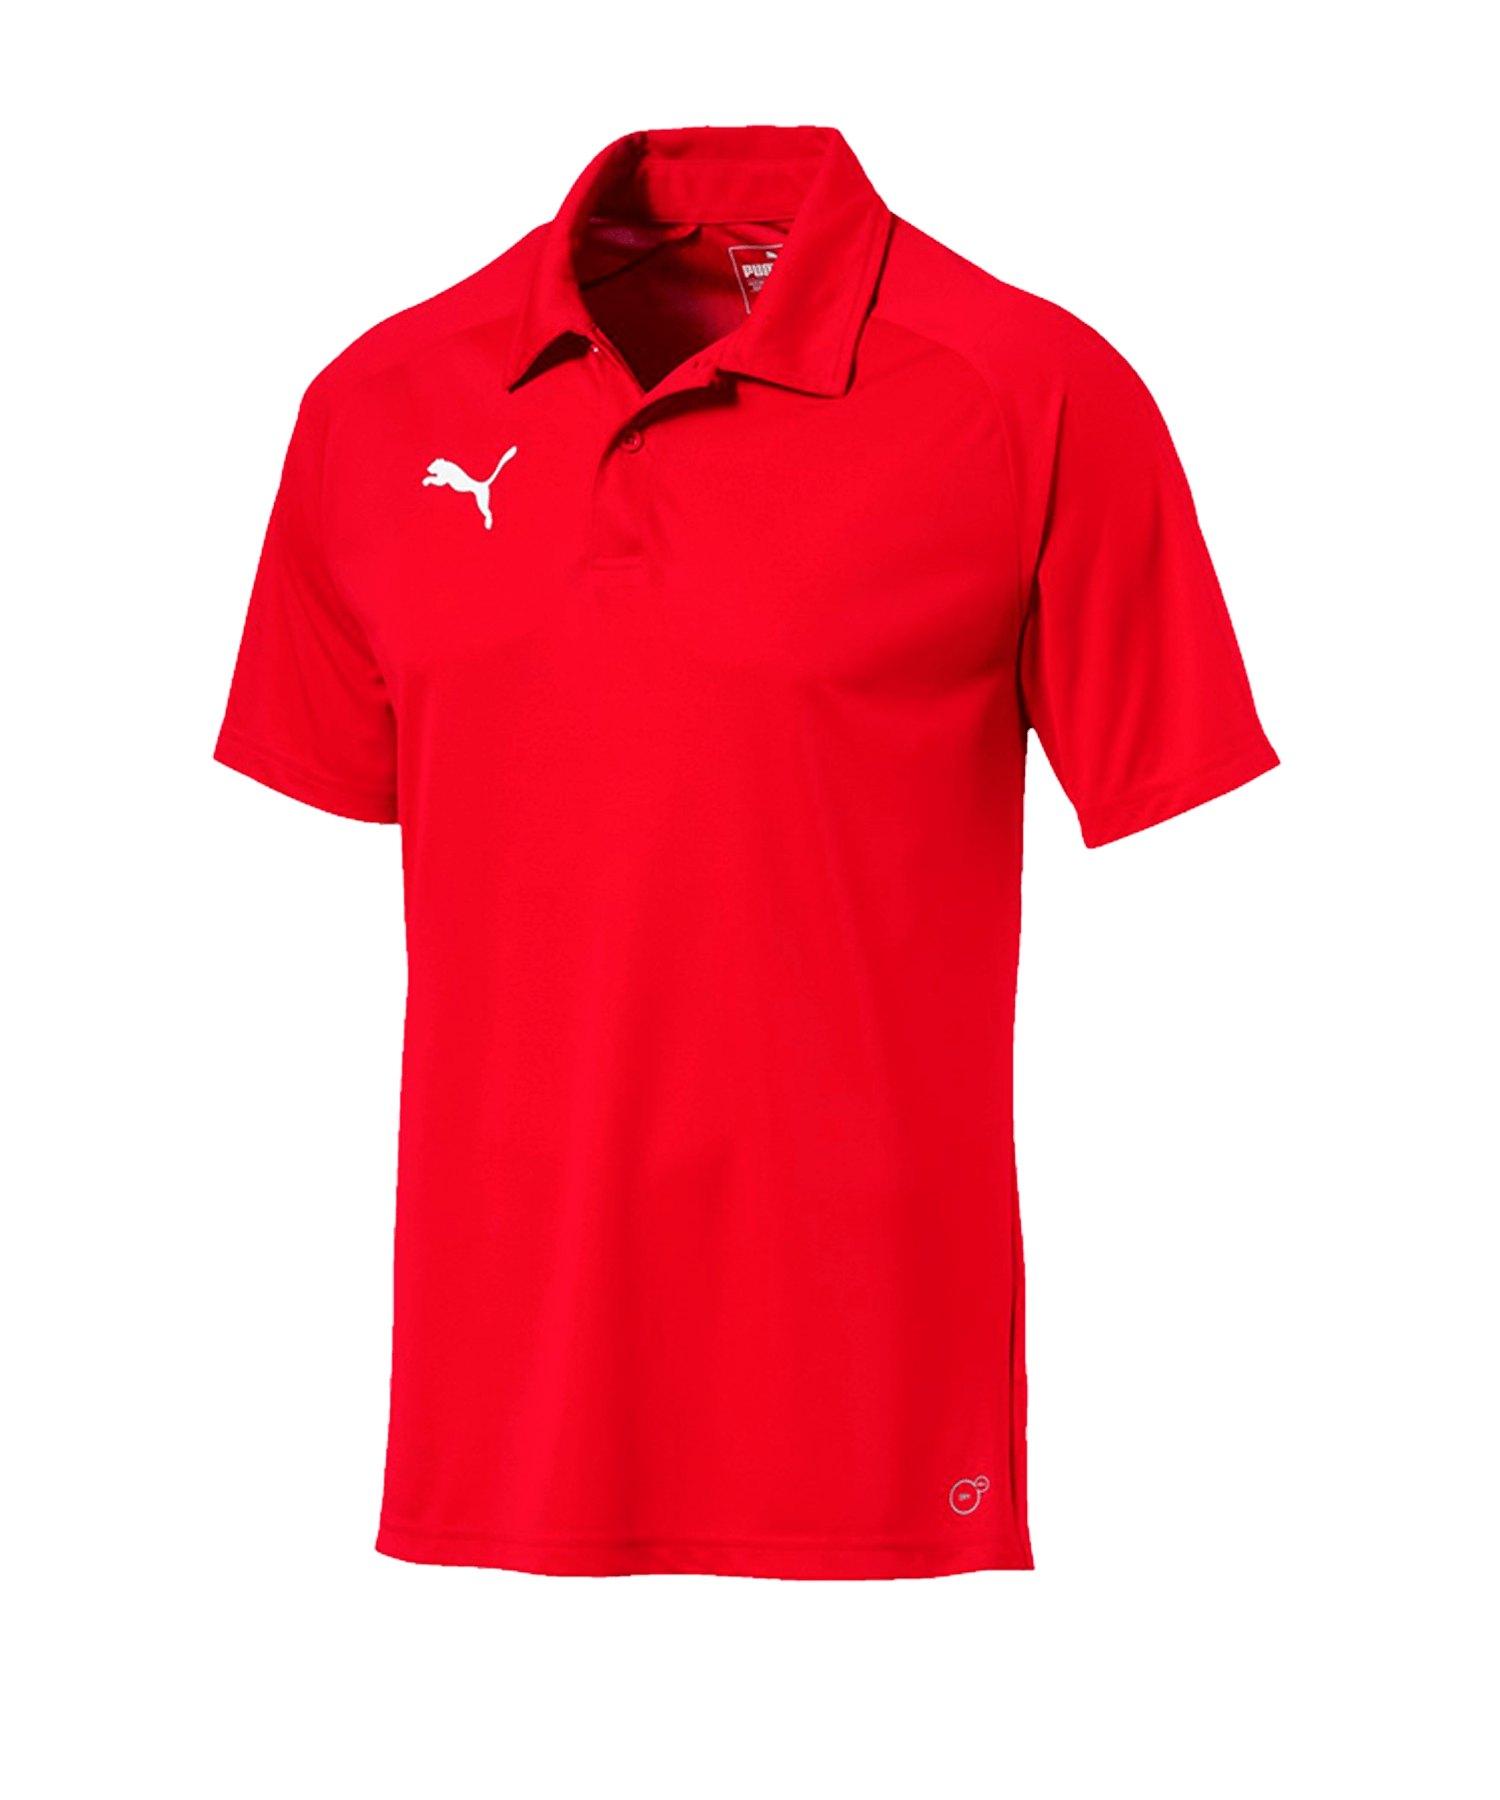 PUMA LIGA Sideline Poloshirt Rot Weiss F01 - rot